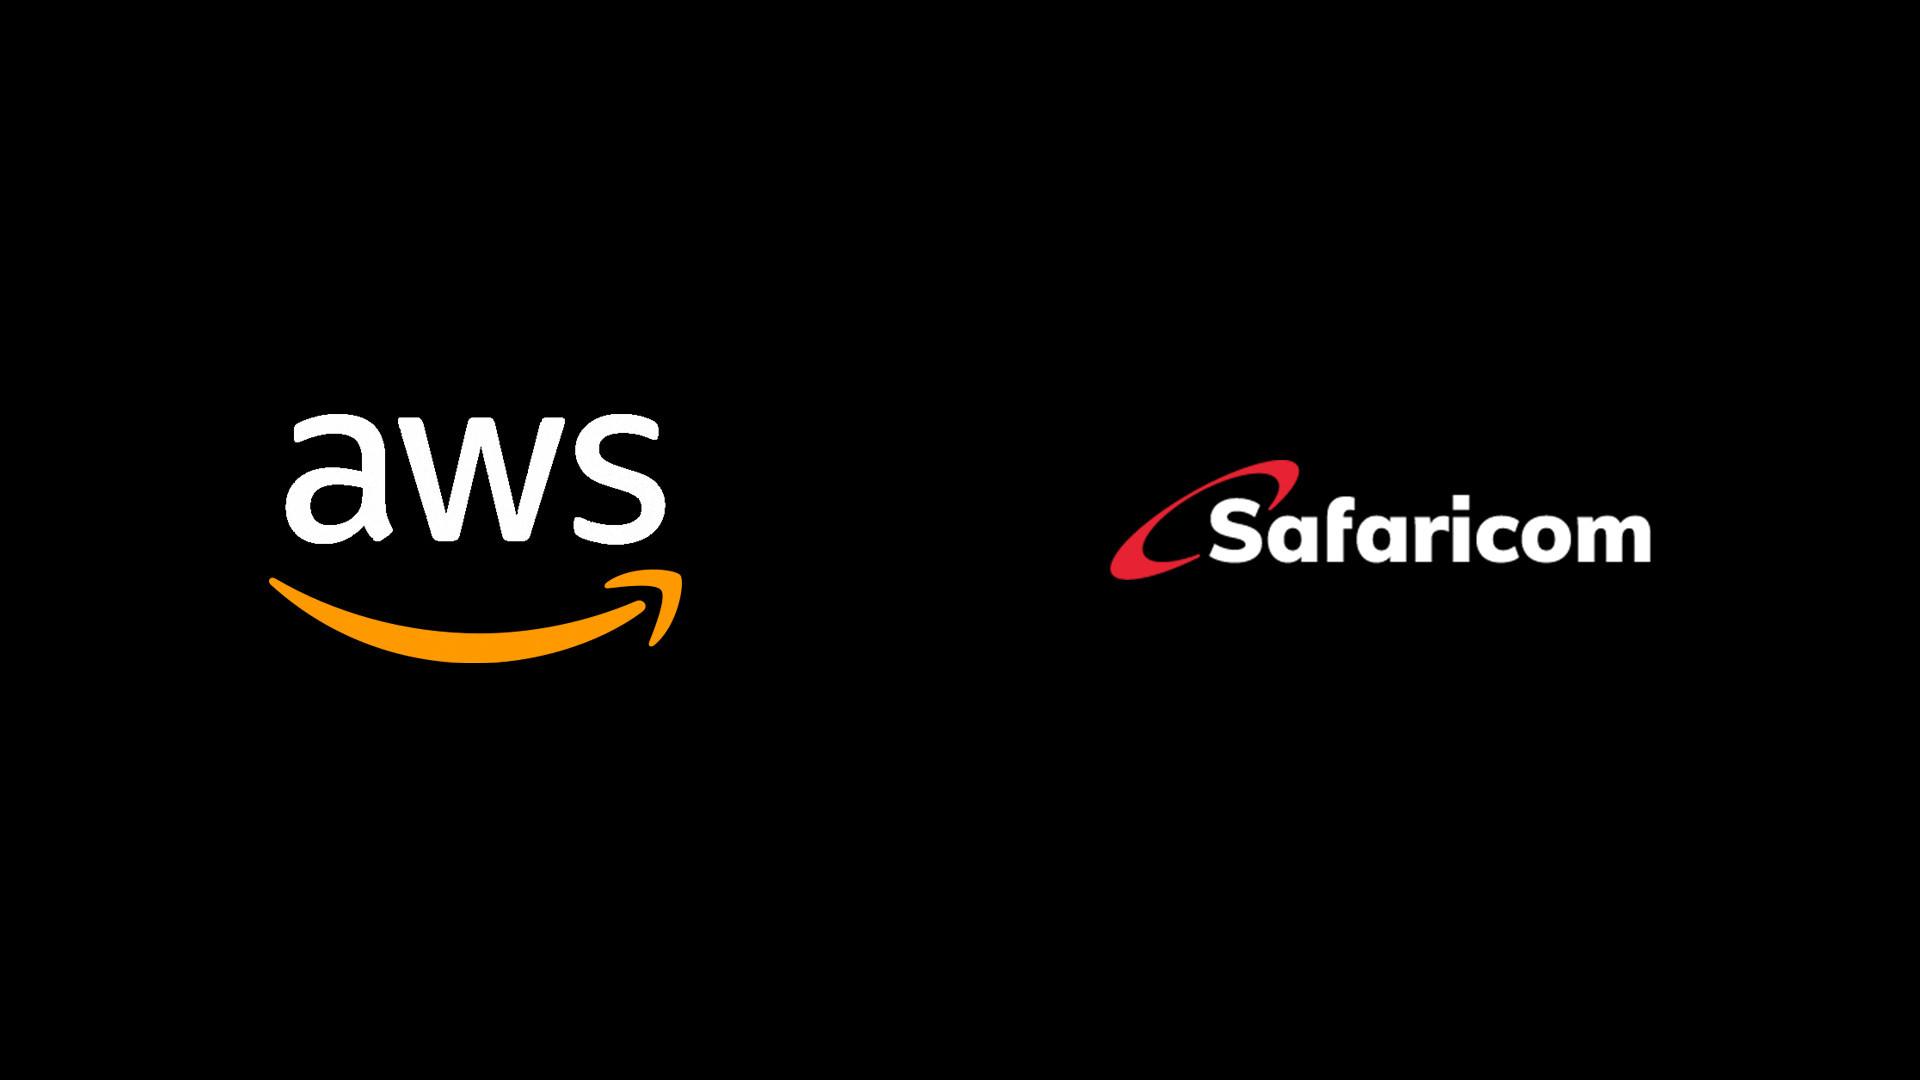 AWS 同 Safaricom 就云服务及咨询业务展开合作